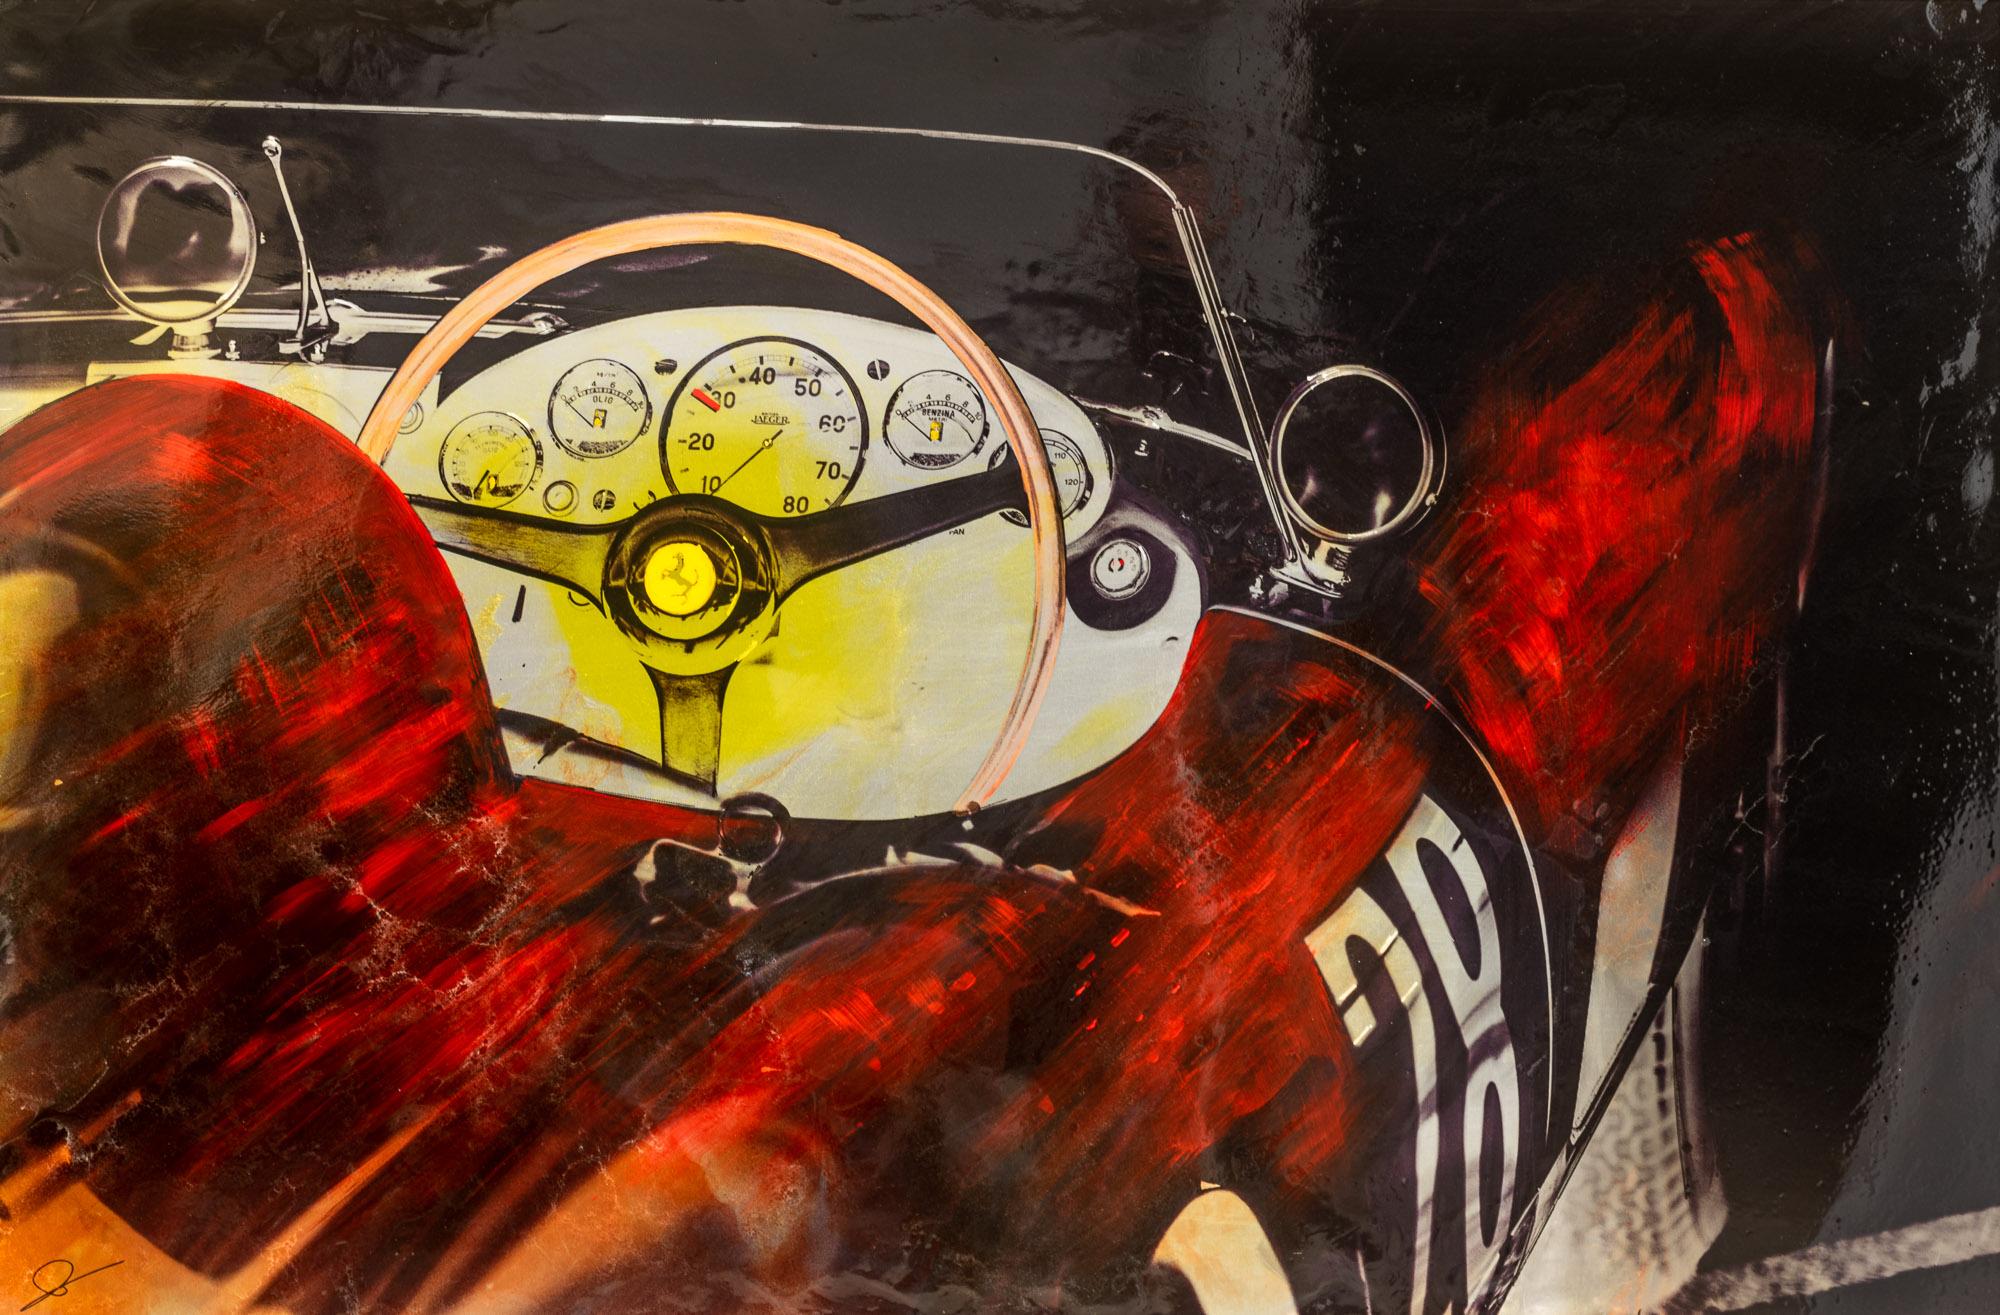 Ferrari Dreaming - An Original Motorsports Art Painting by Paul Kenton